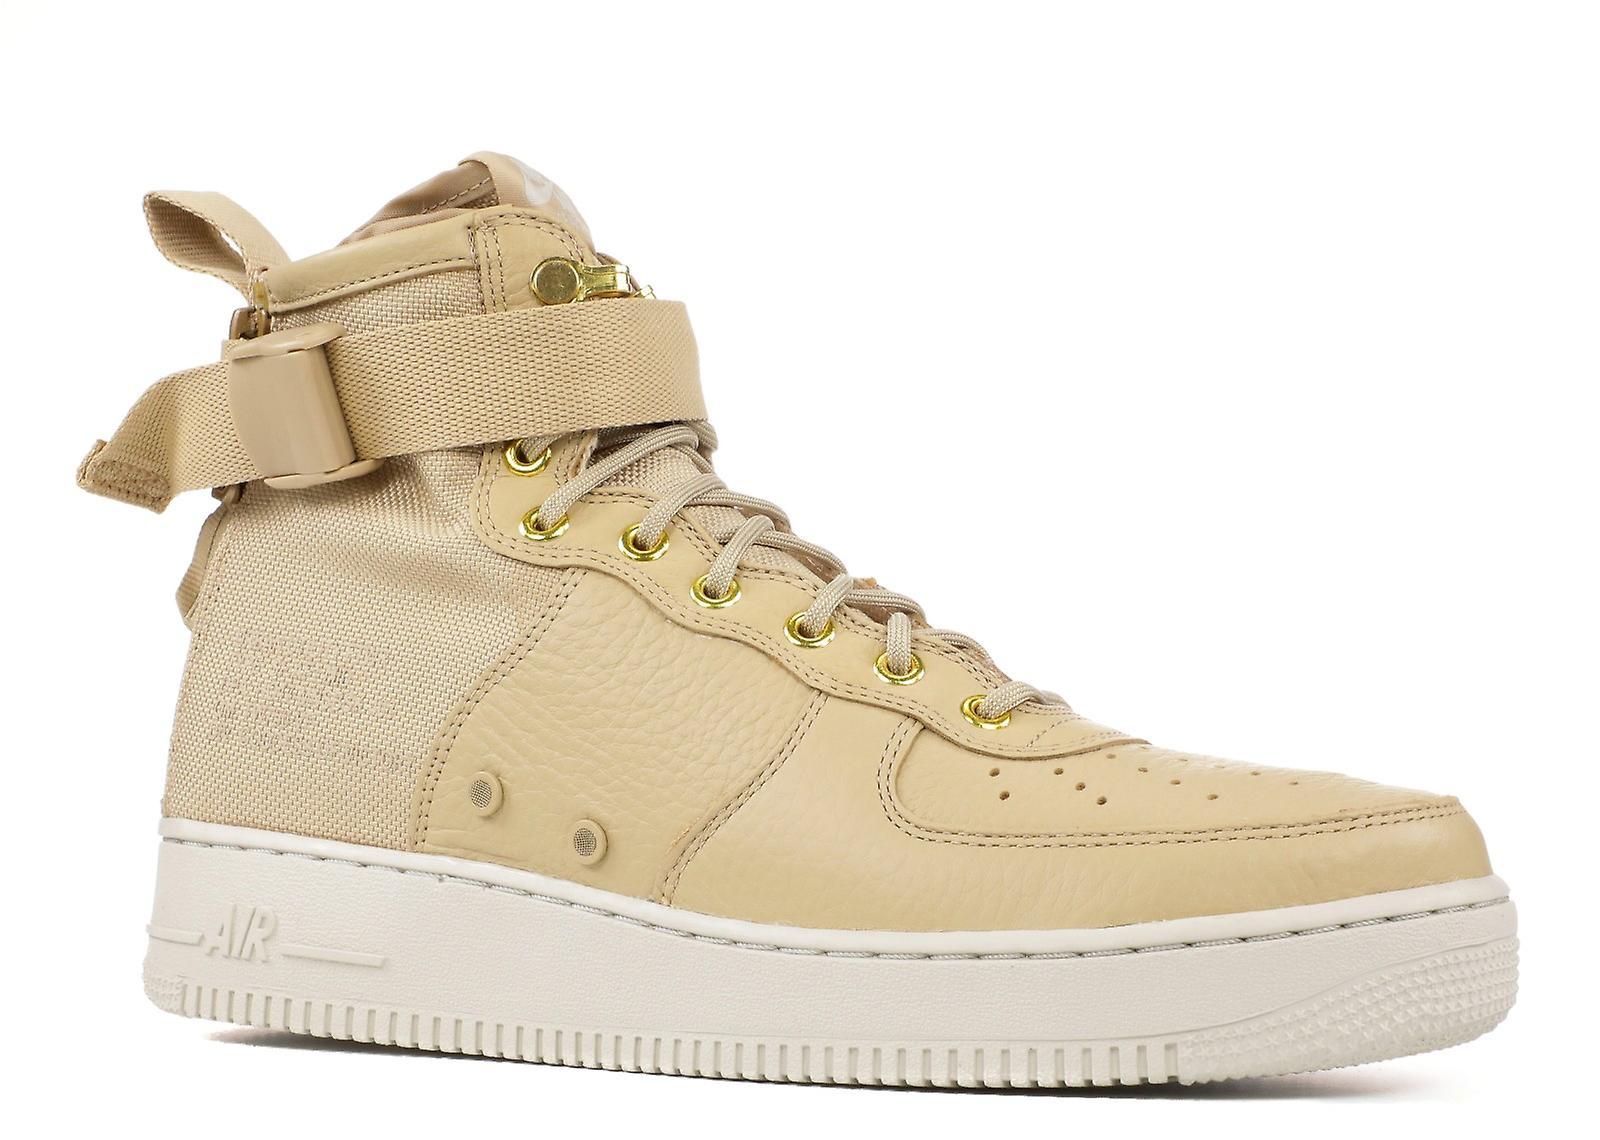 SF Af1 Mid - 917753 - 200 - scarpe | Bella Ed Affascinante Della  | Scolaro/Ragazze Scarpa